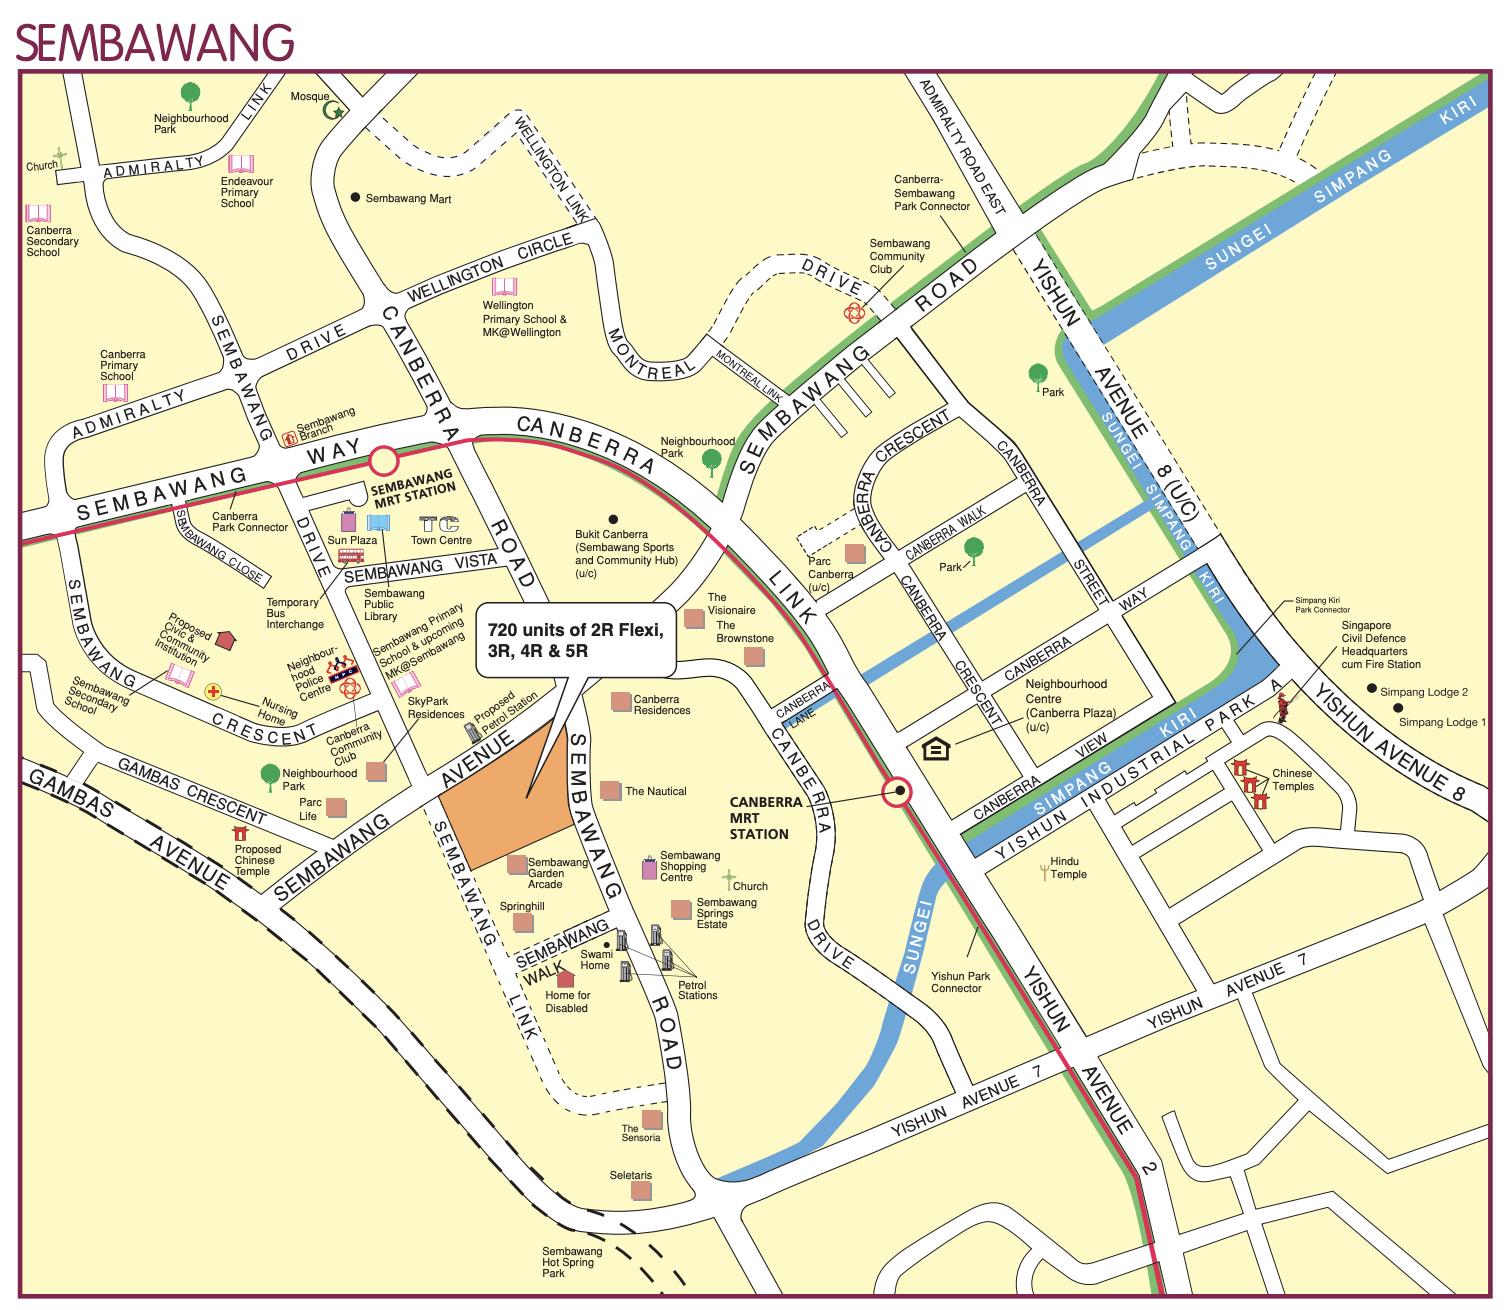 HDB BTO November 2020 Launch in Non-Mature Estates — Sembawang and Tengah